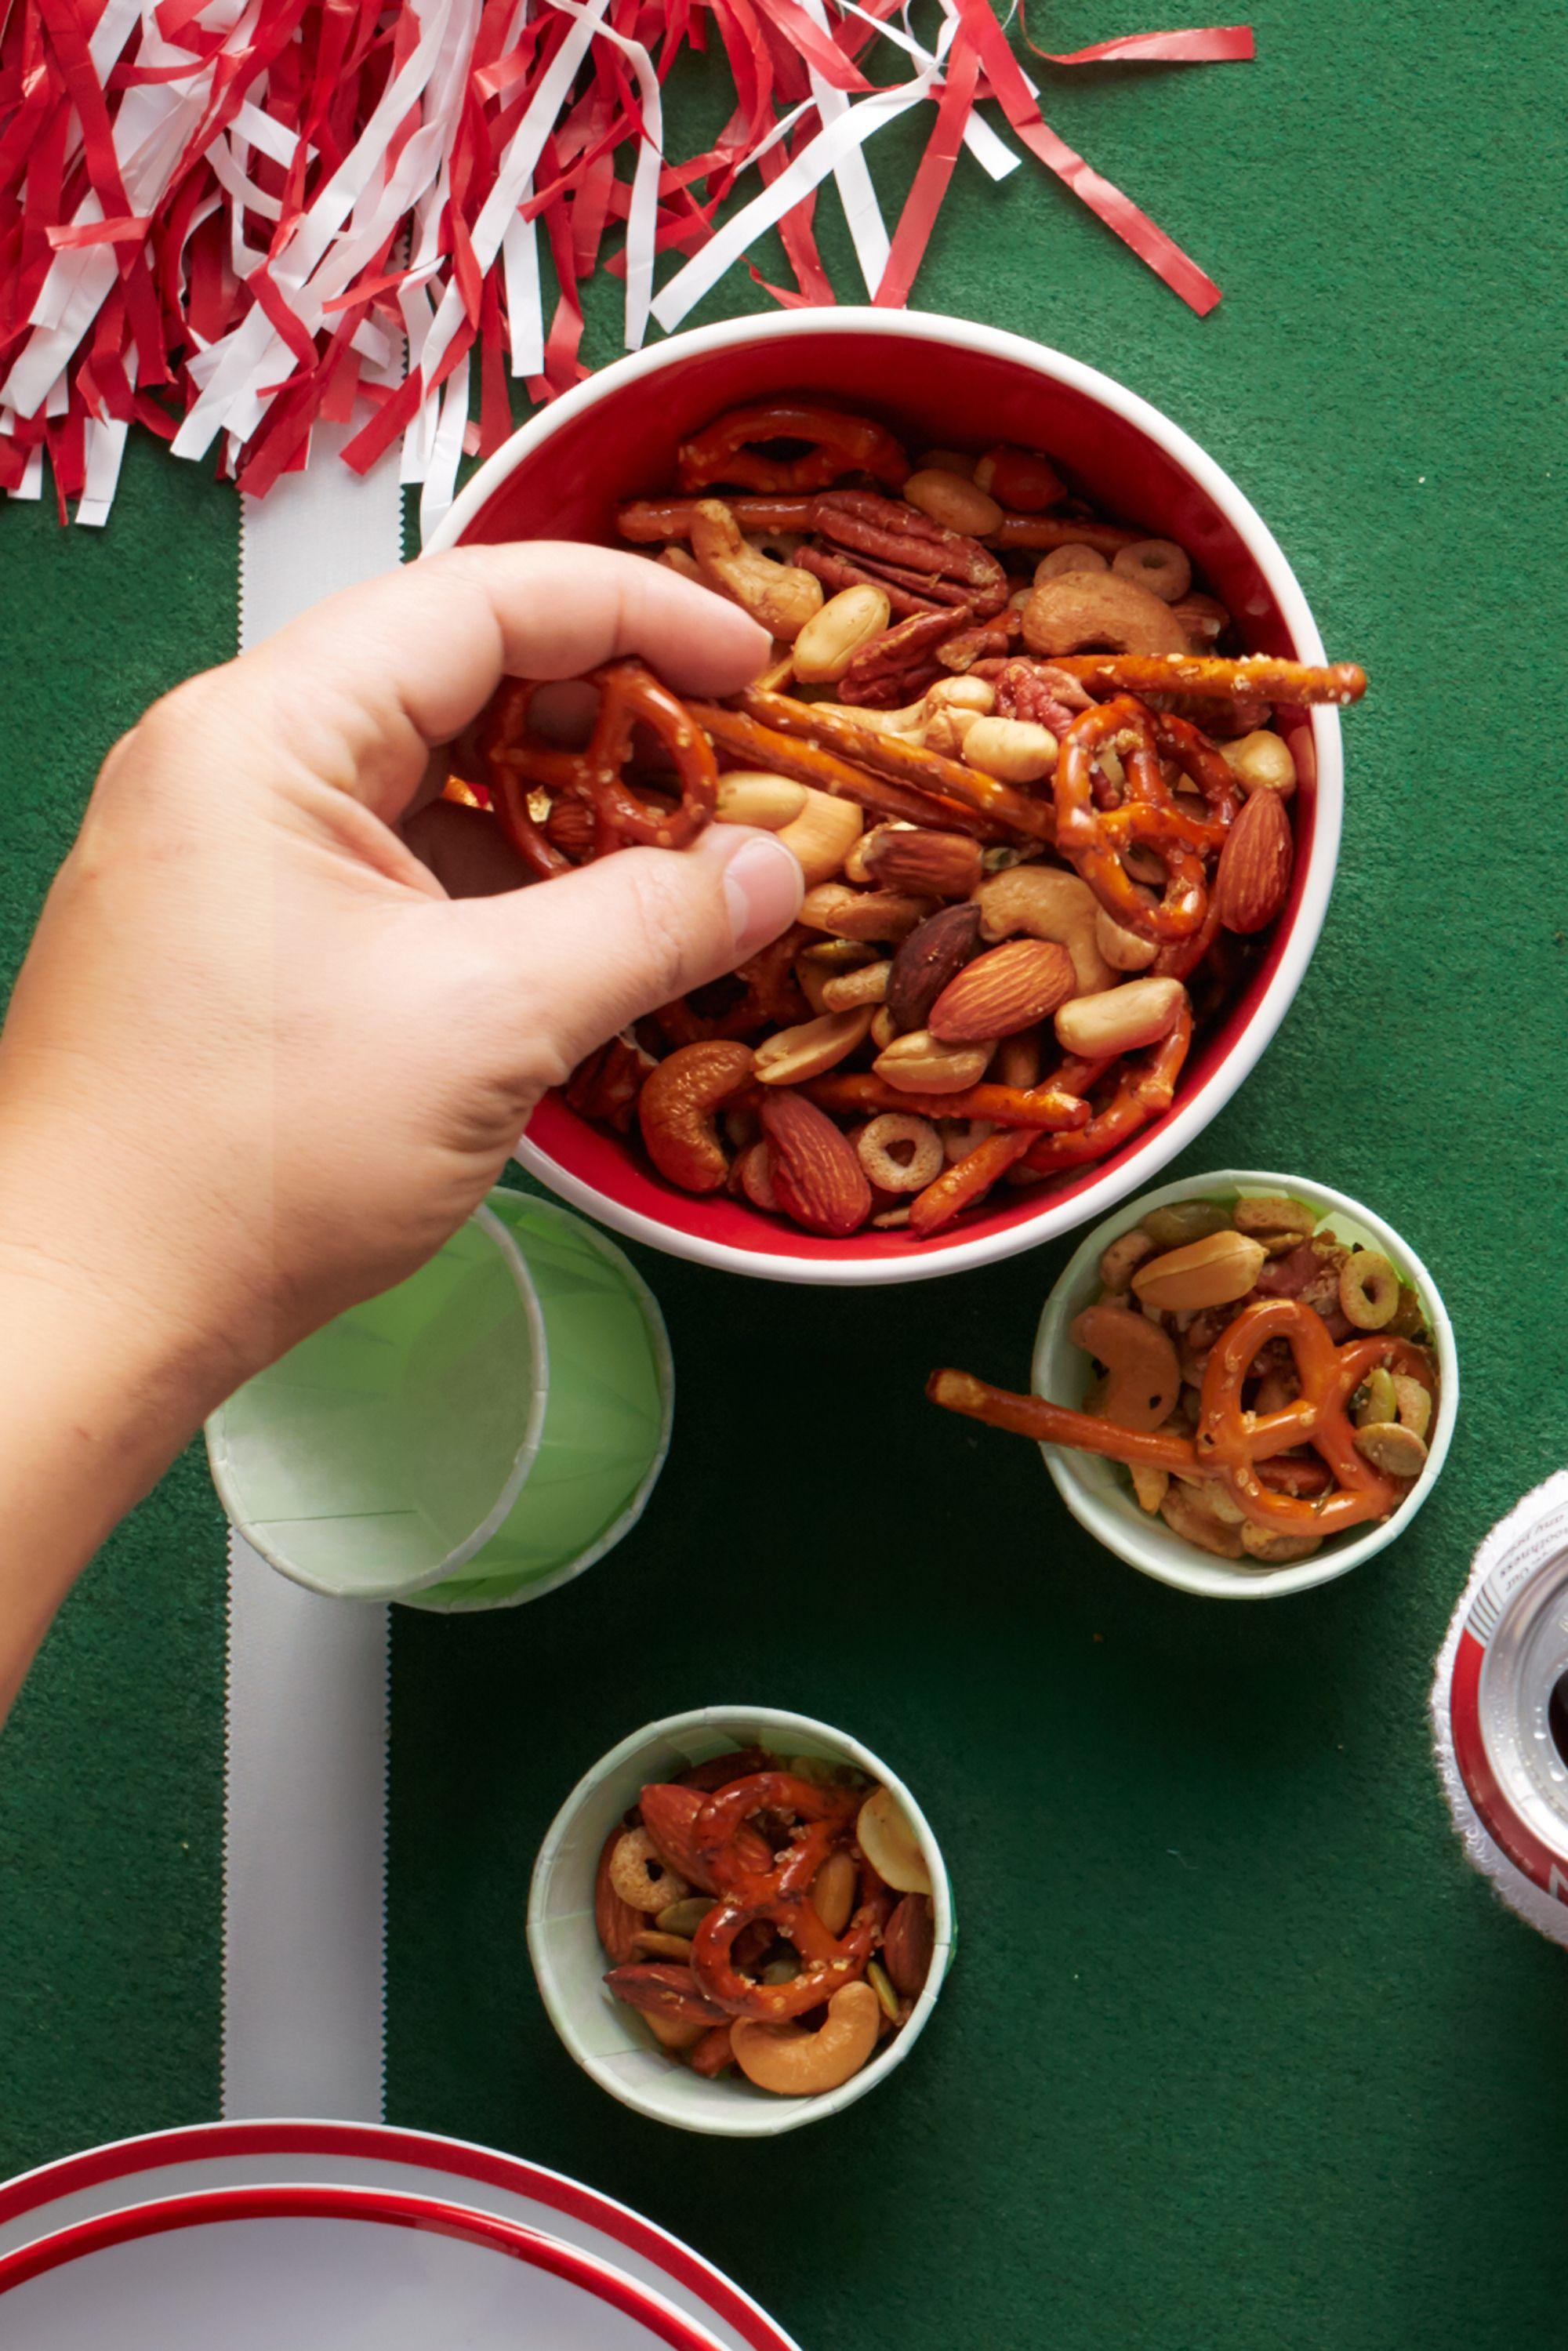 45 super bowl snack recipes - football party food ideas